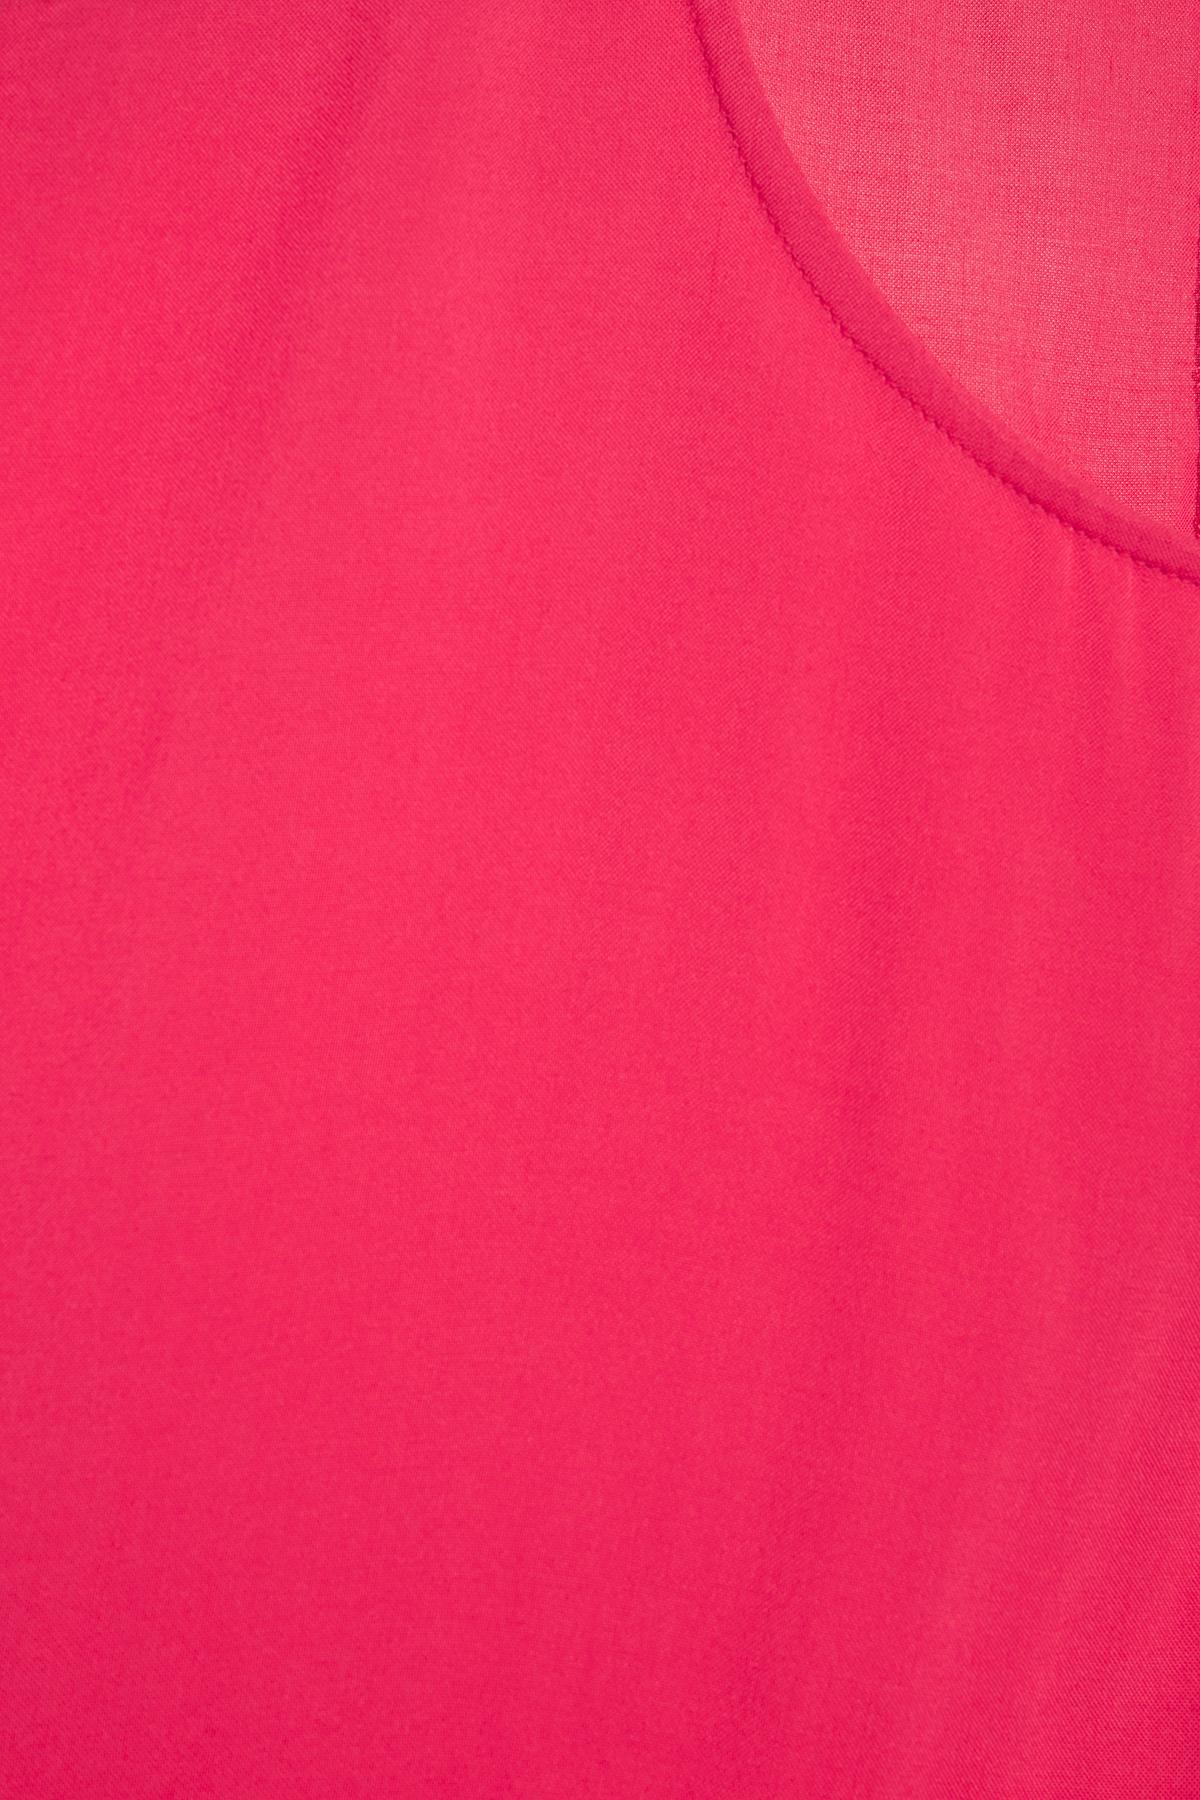 Himbeerrot Kurzarm-Bluse von b.young – Shoppen Sie Himbeerrot Kurzarm-Bluse ab Gr. 34-46 hier